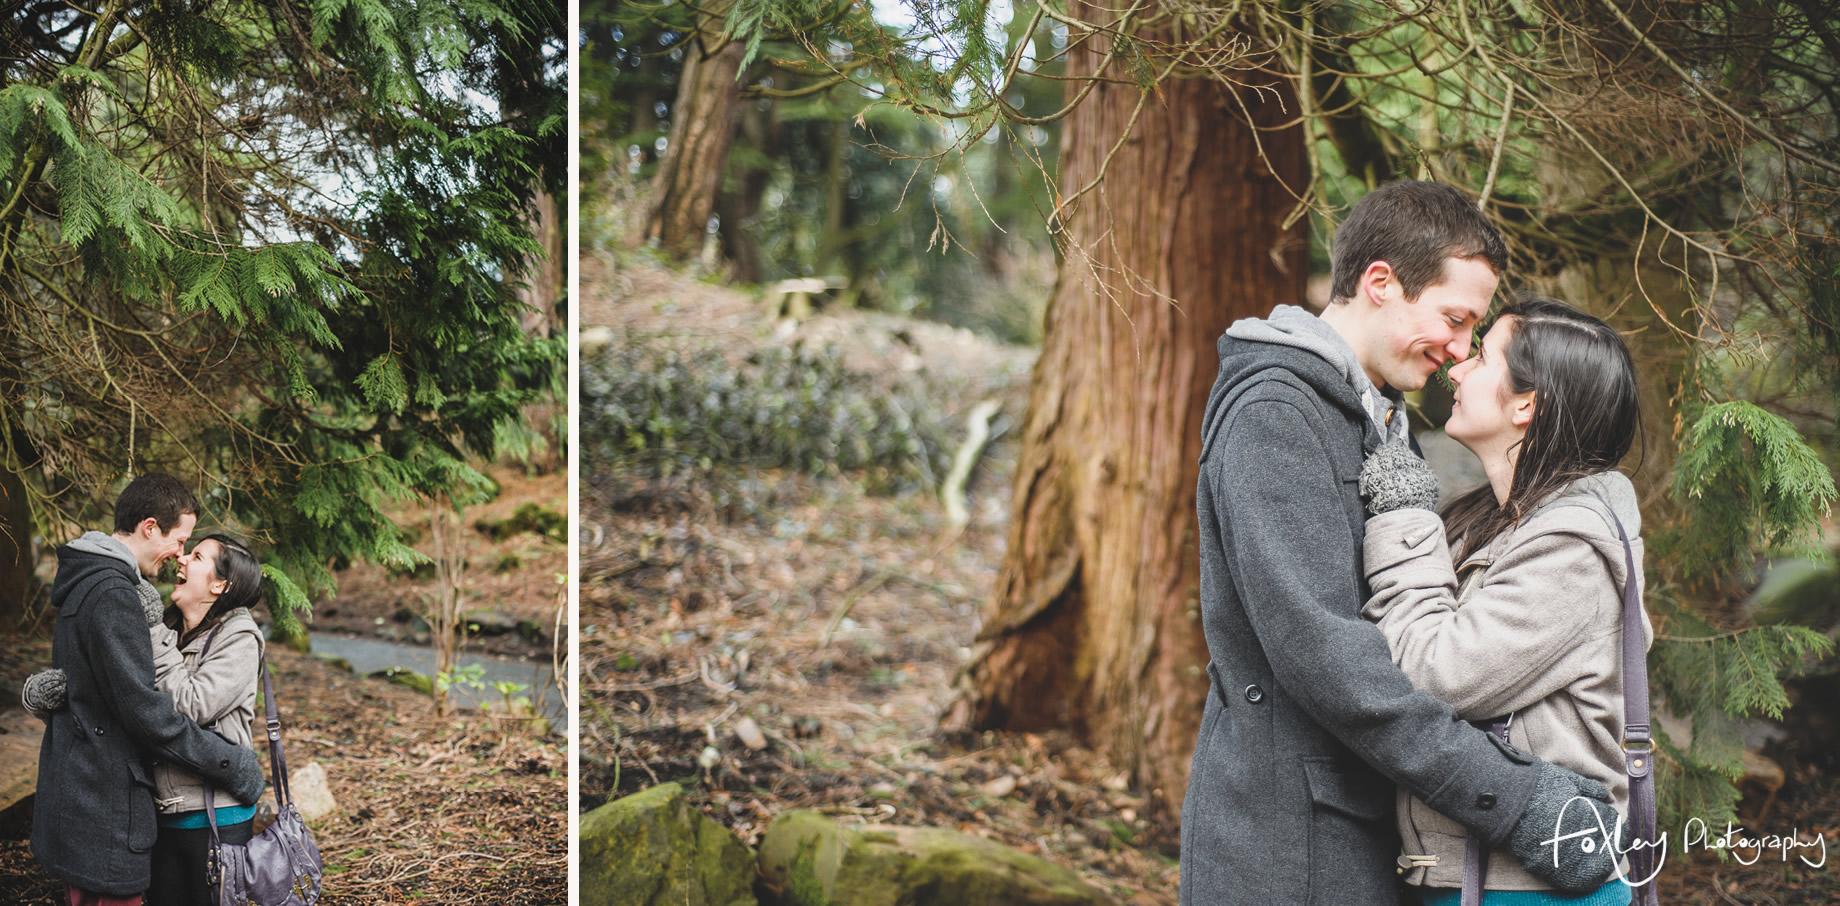 Emma-and-Phil-Pre-Wedding-Shoot-Ashton-Memorial-016